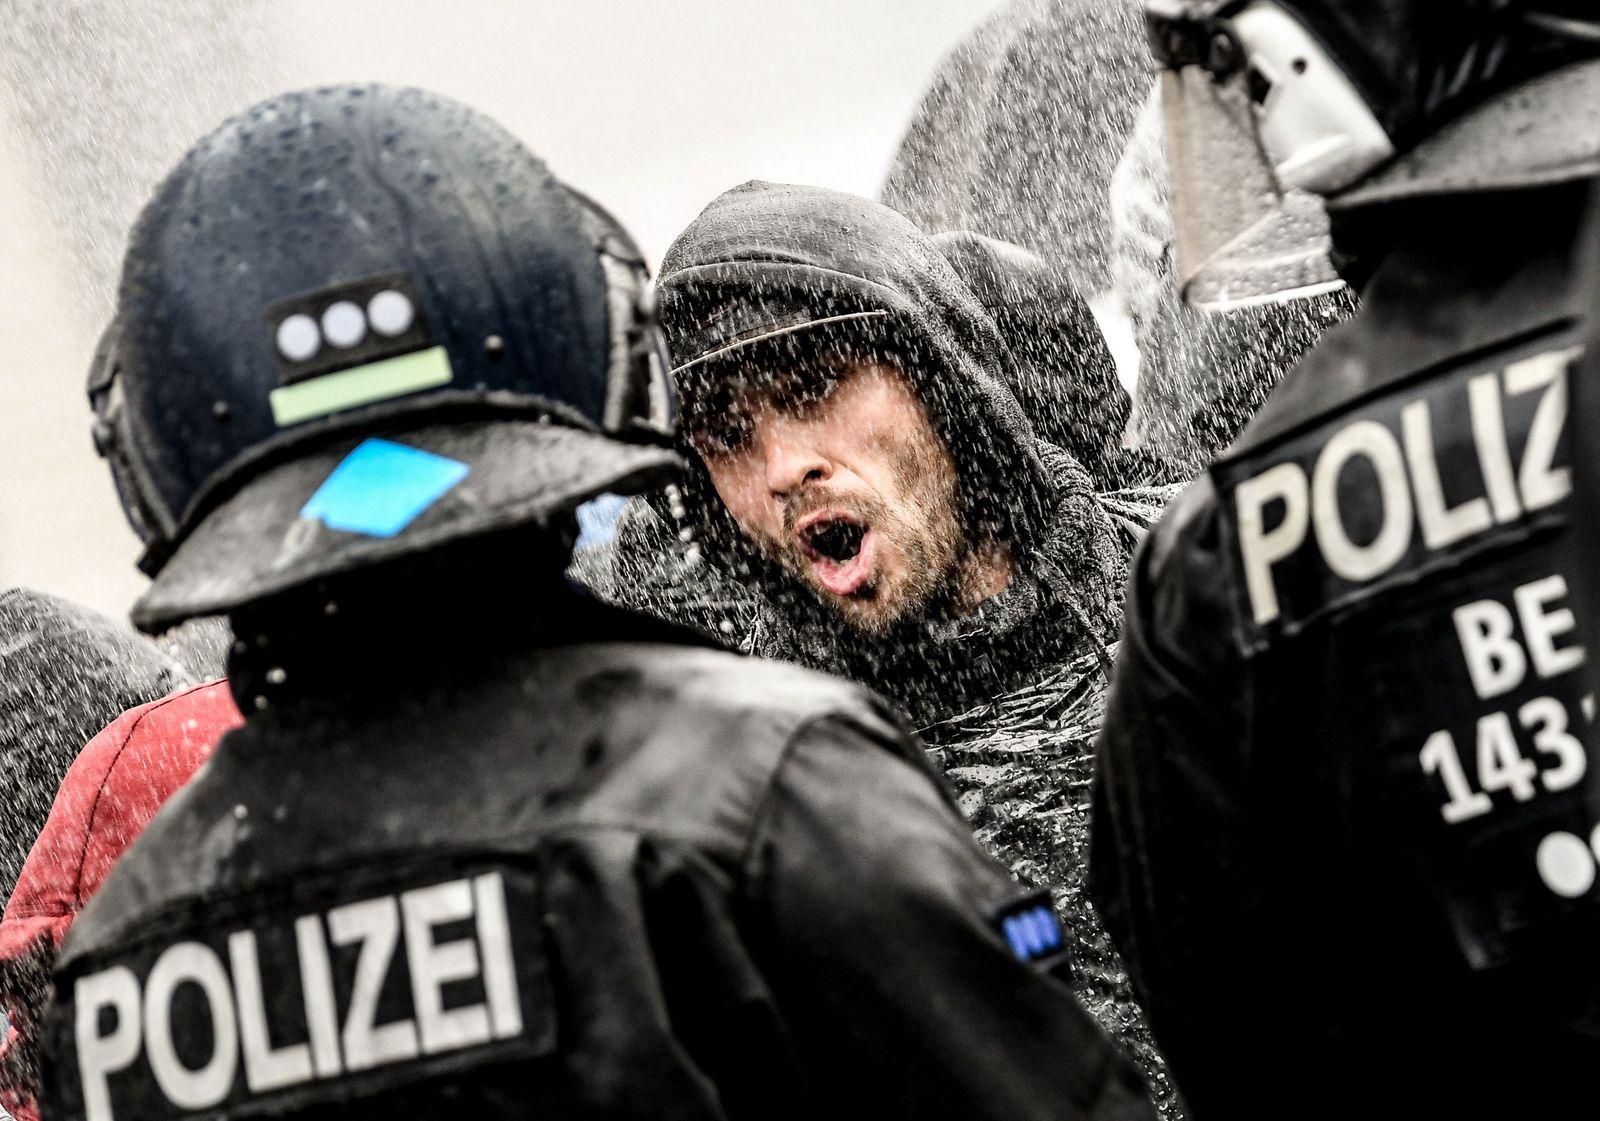 Demonstration against coronavirus restrictions in Berlin, Germany - 18 Nov 2020